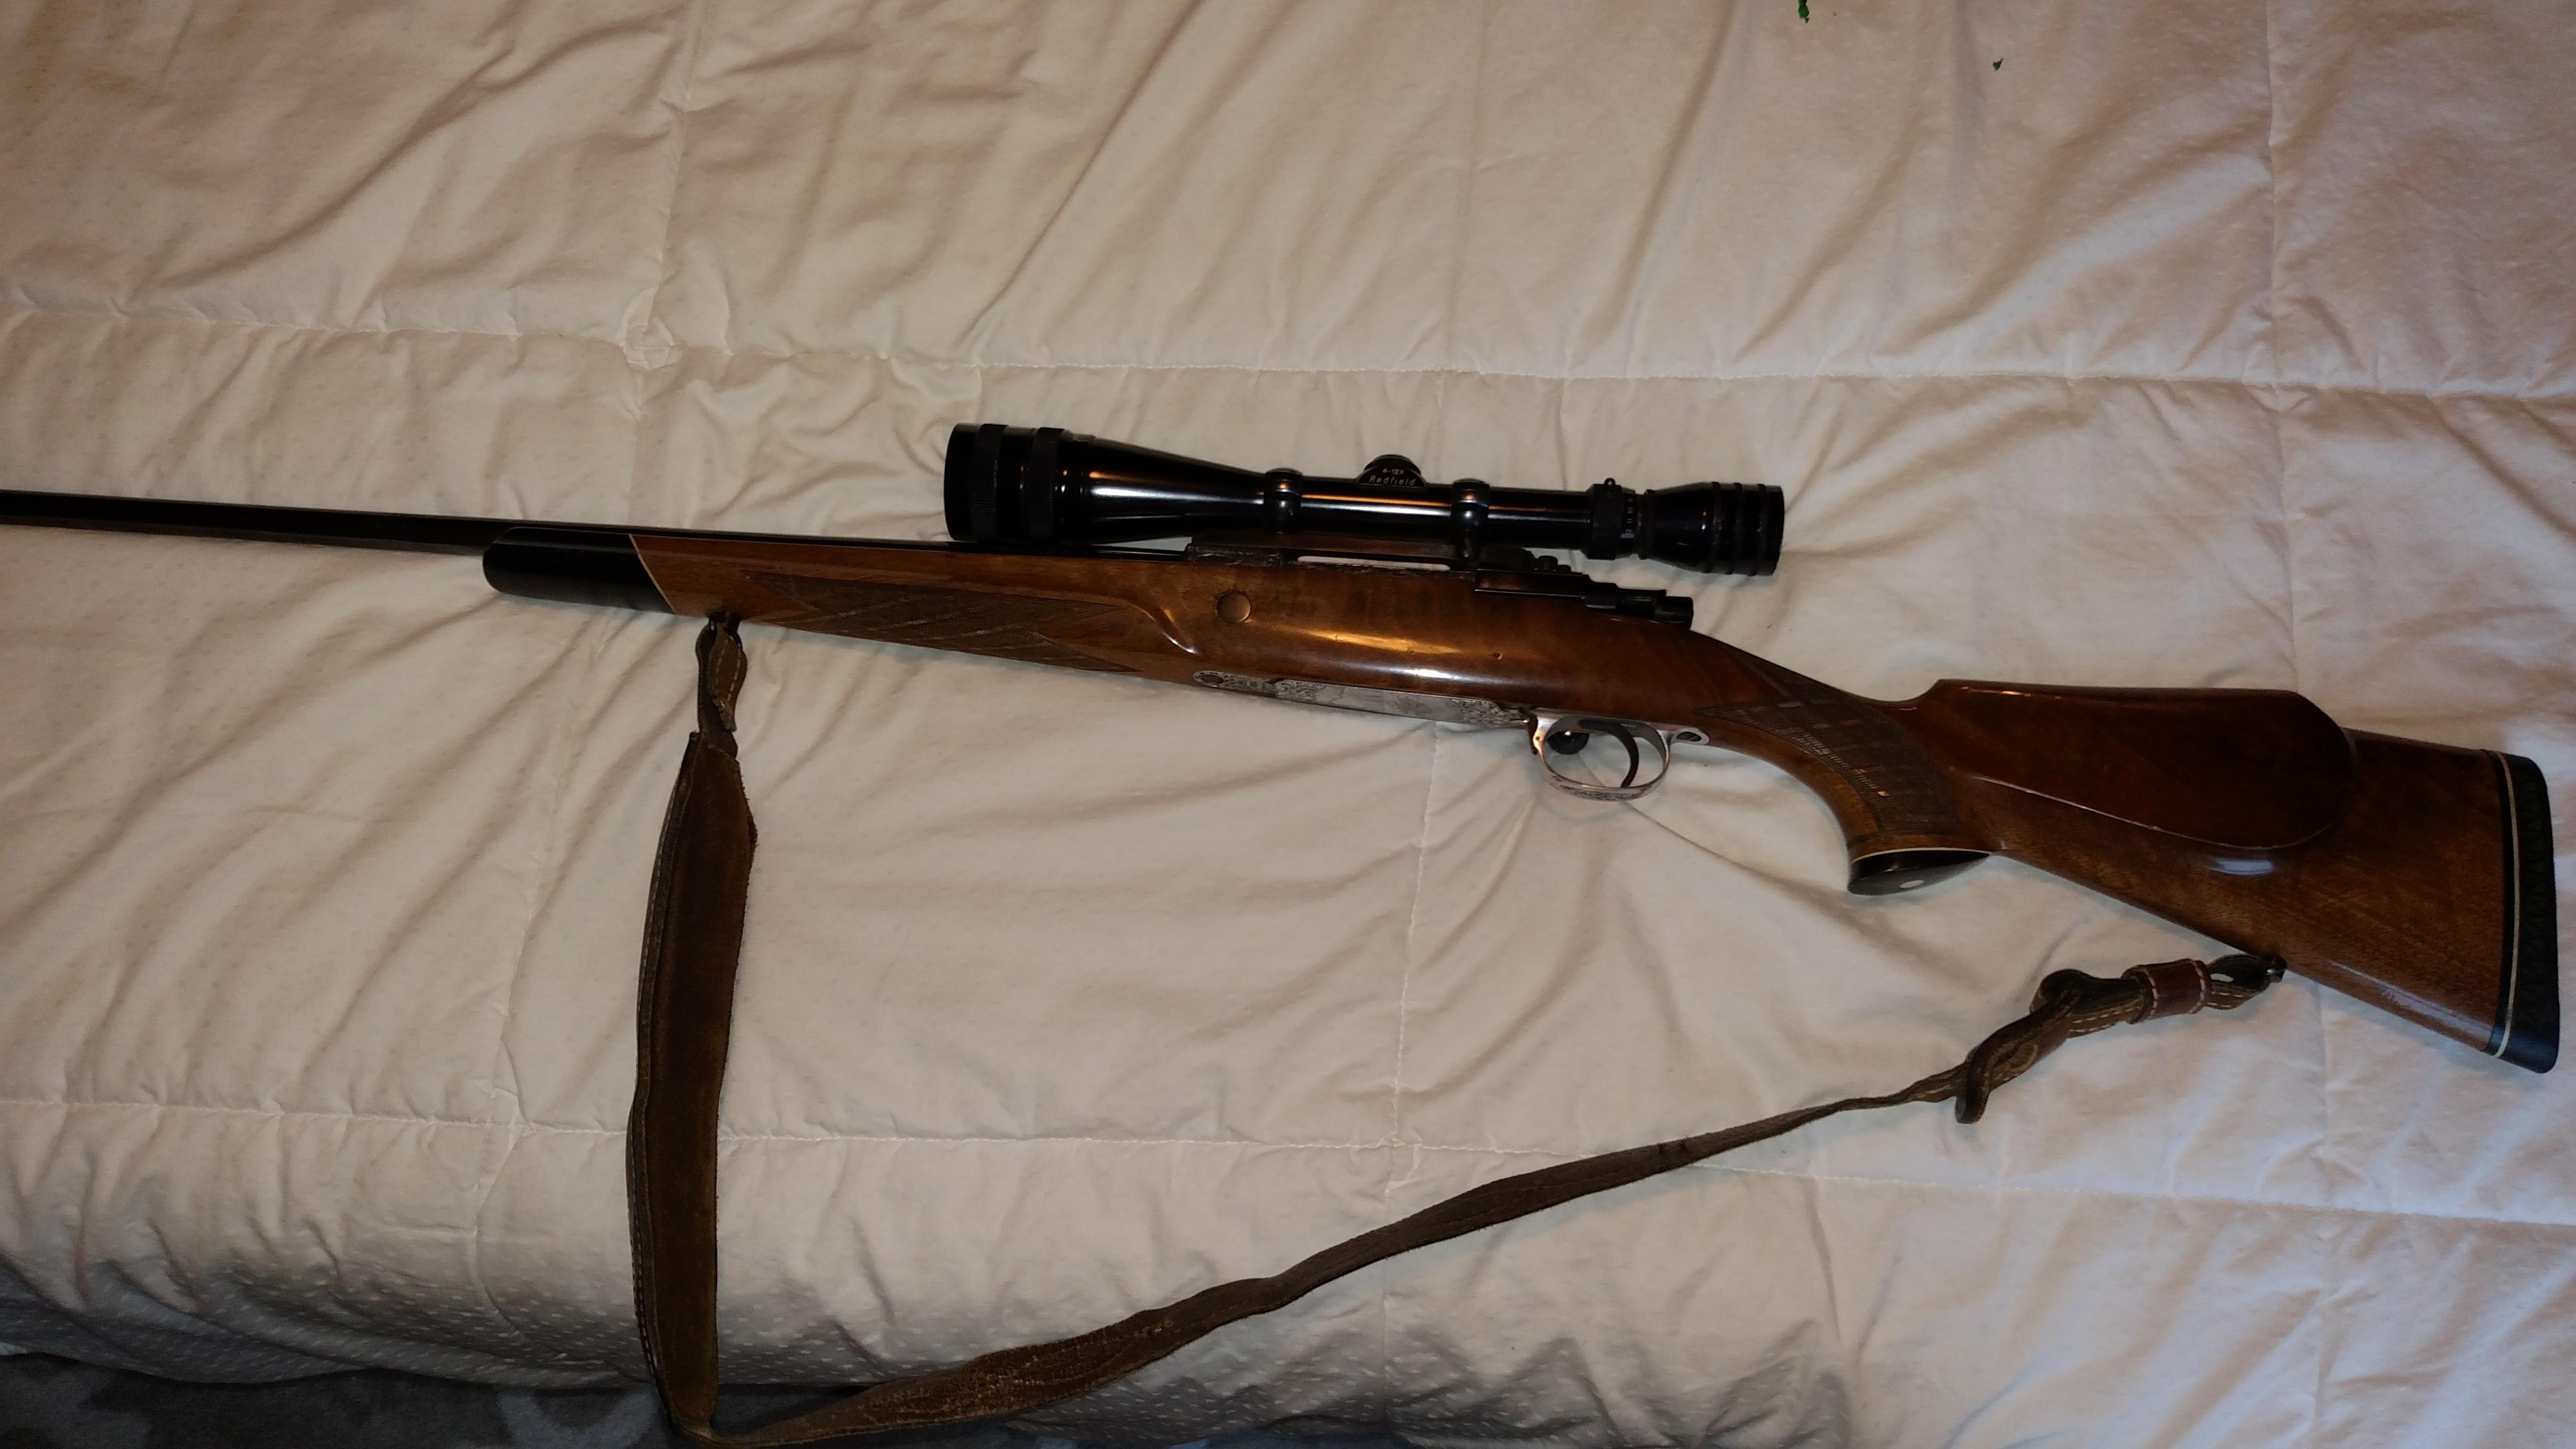 15-07-07_rifle 1.jpg